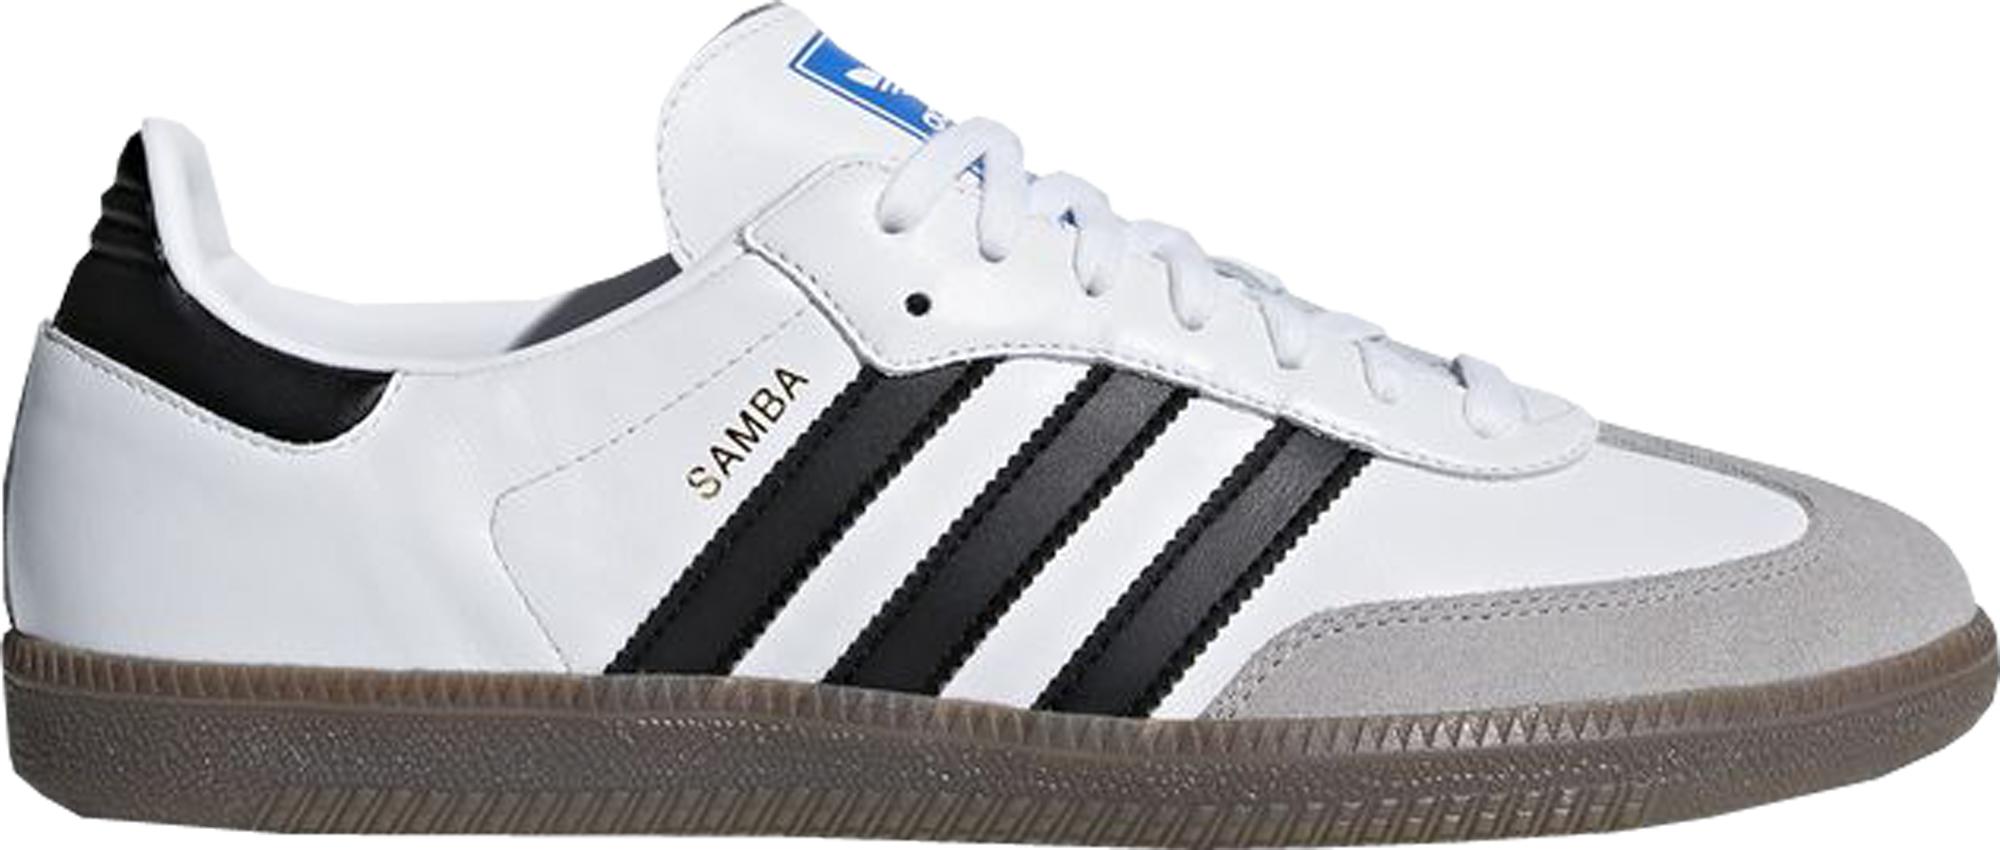 adidas Samba White Black Gum - B75806